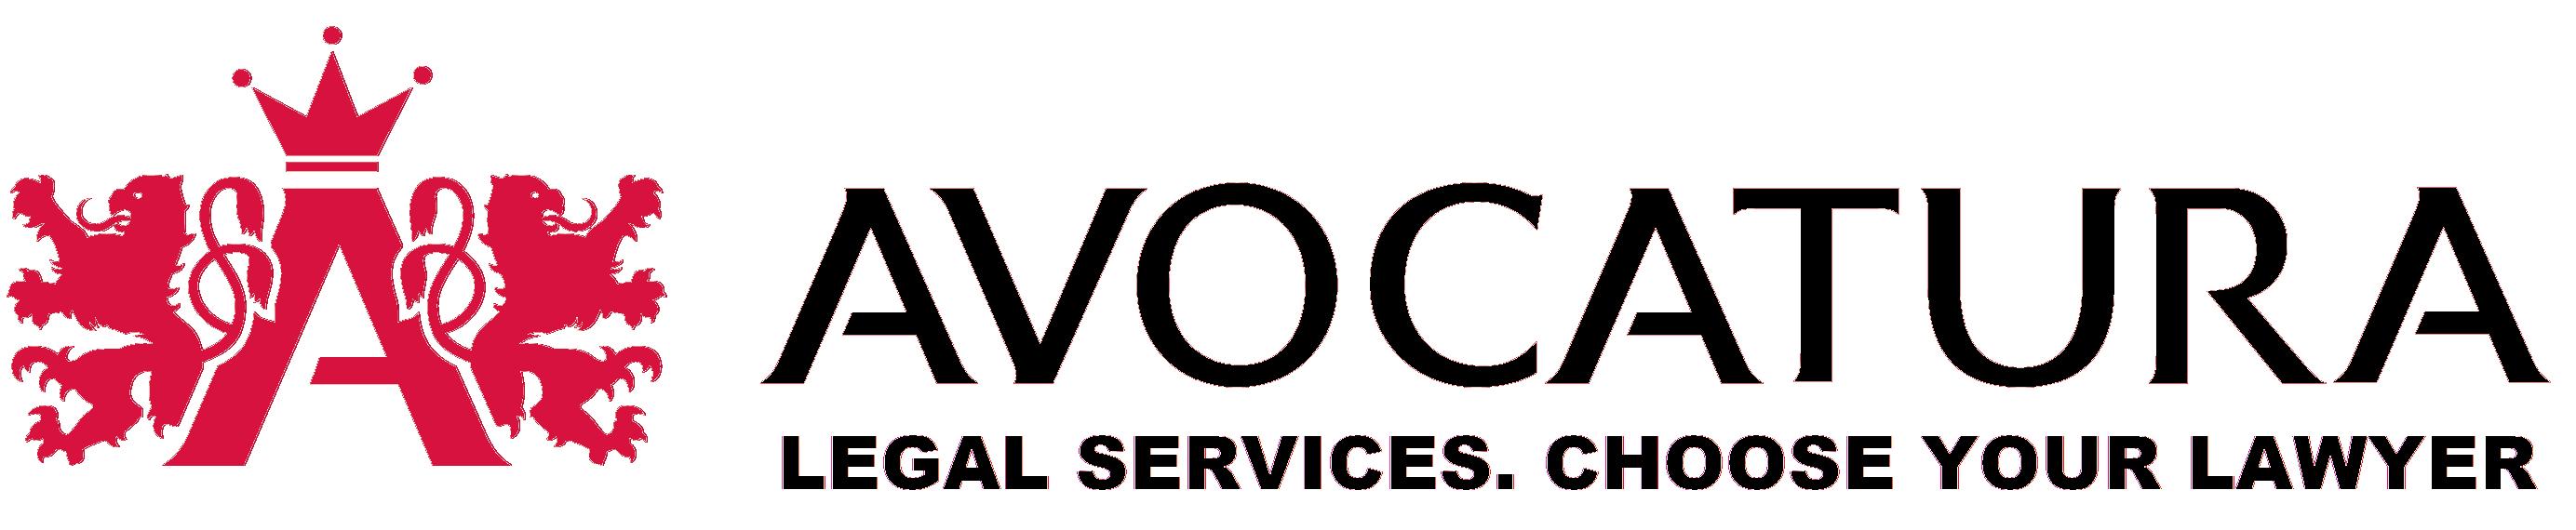 Avocatura.com - Consultanță juridica online